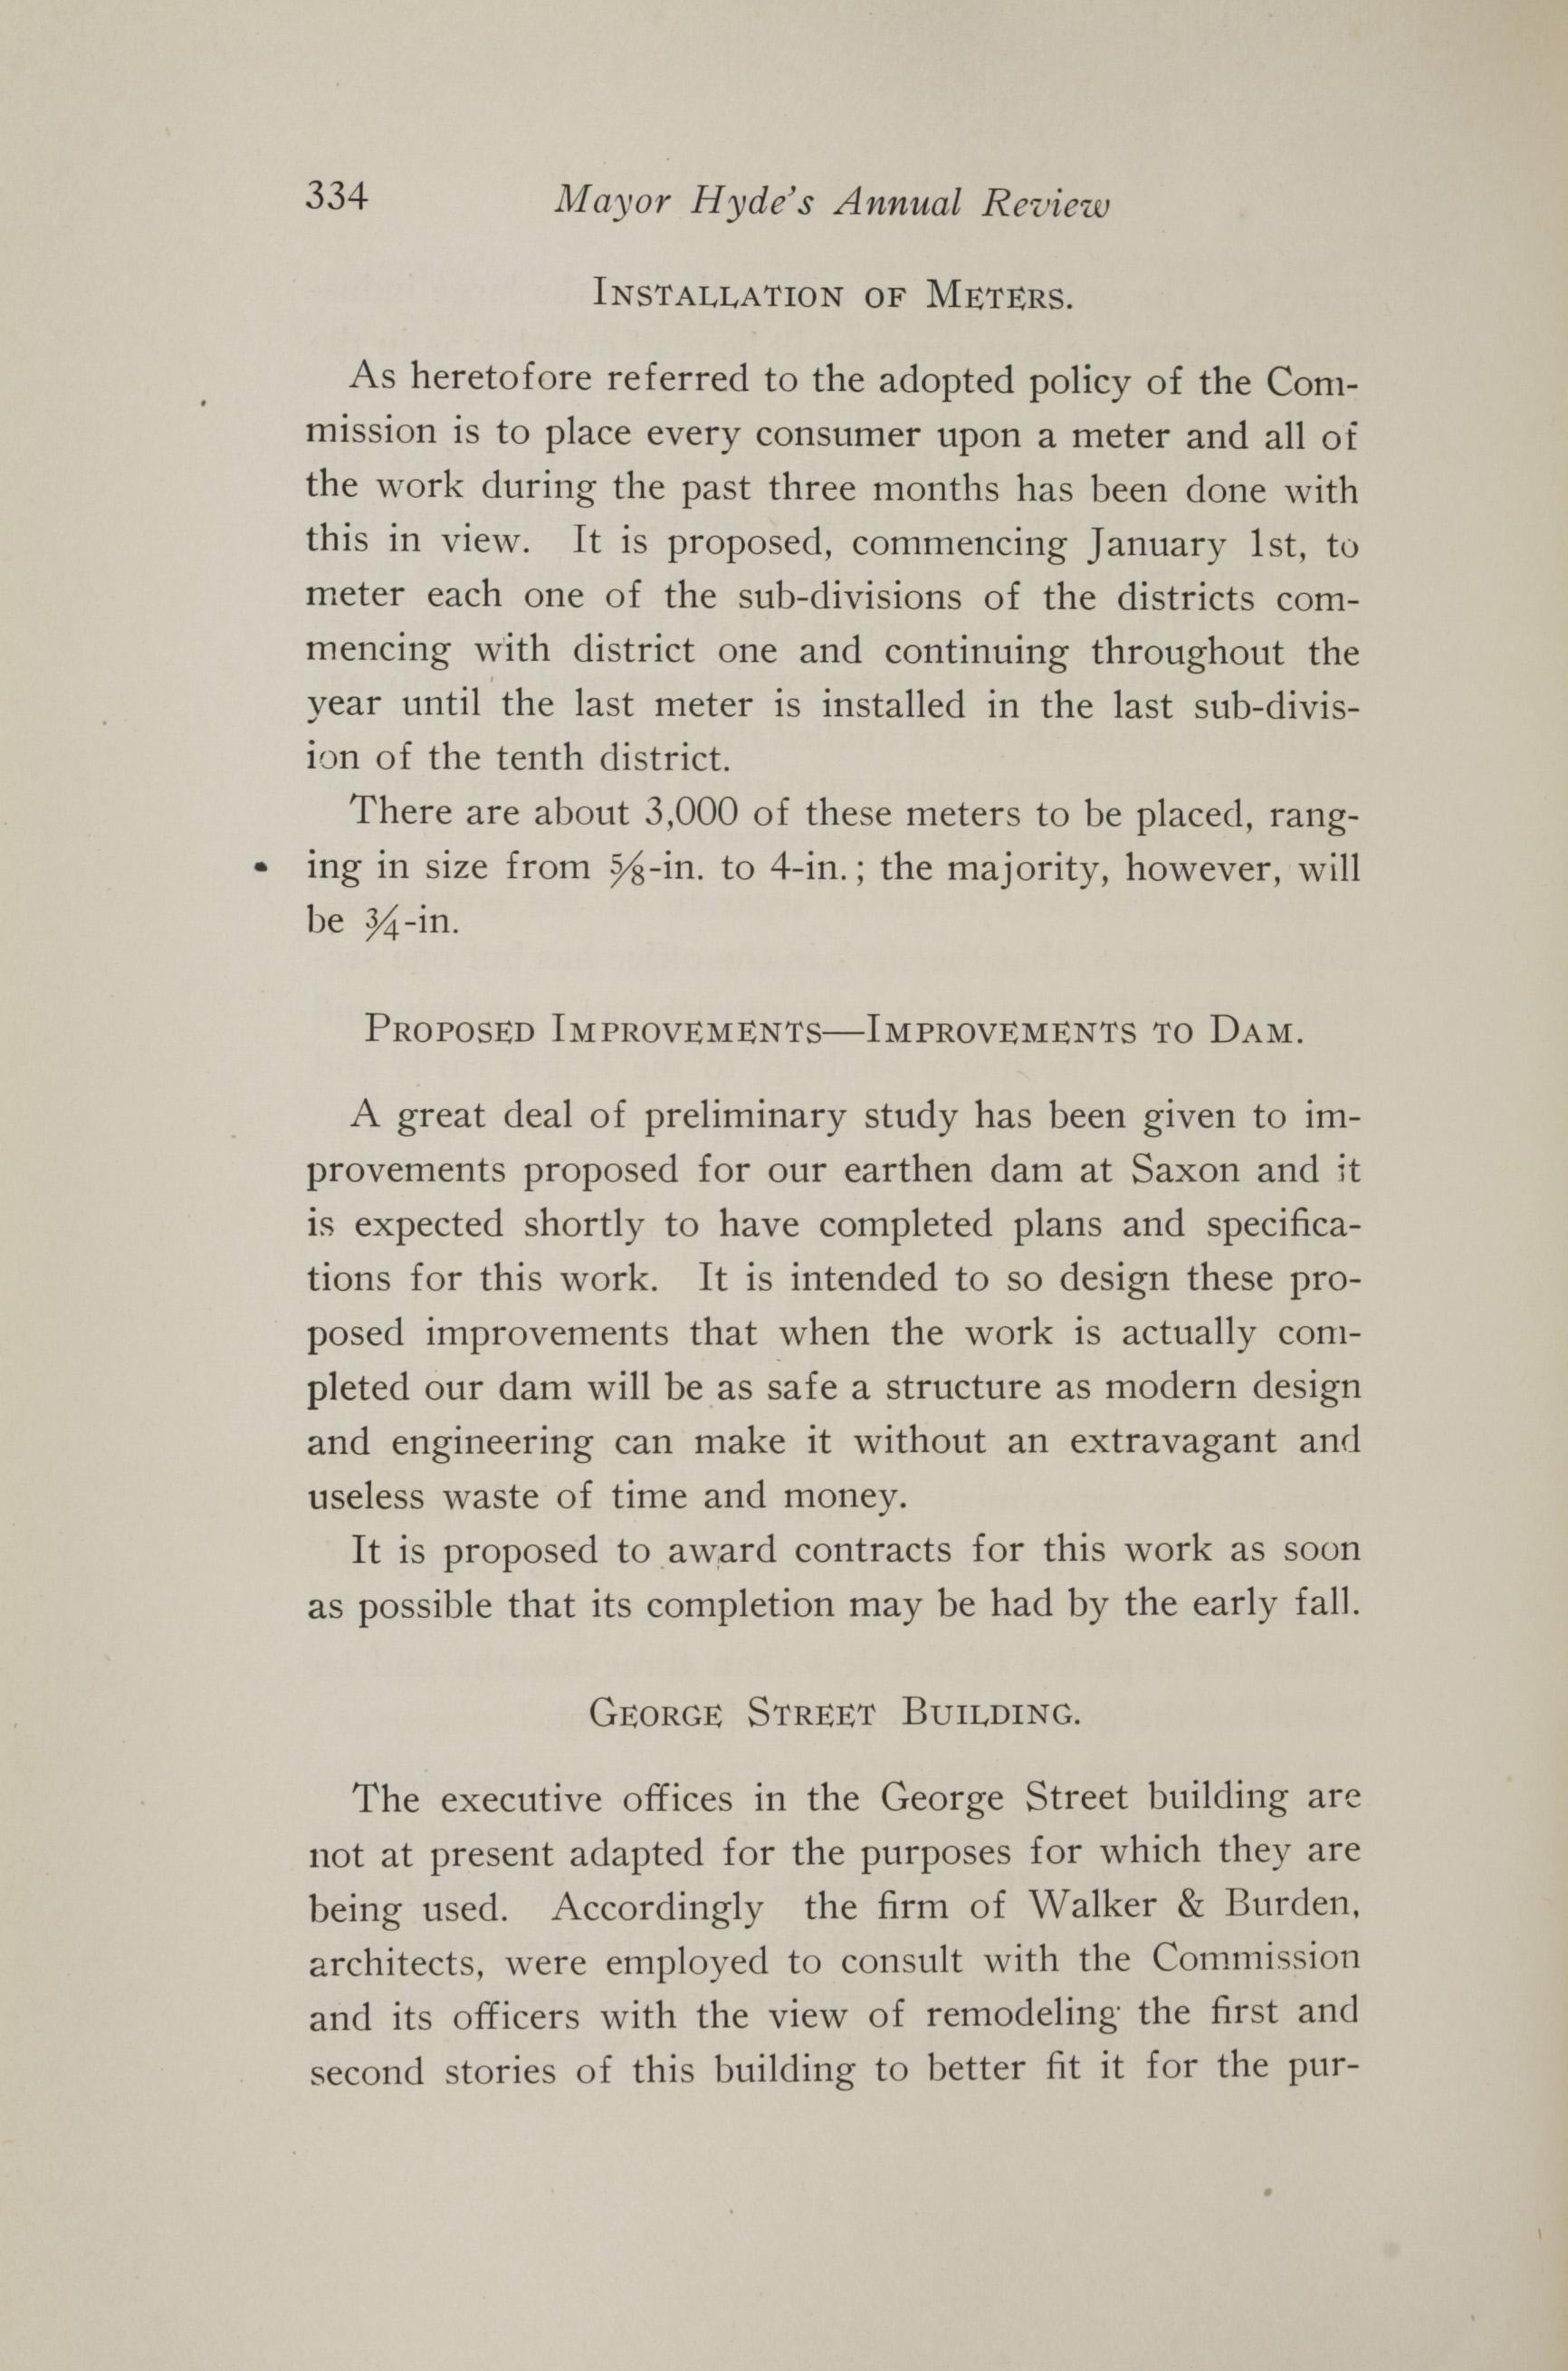 Charleston Yearbook, 1917, page 334